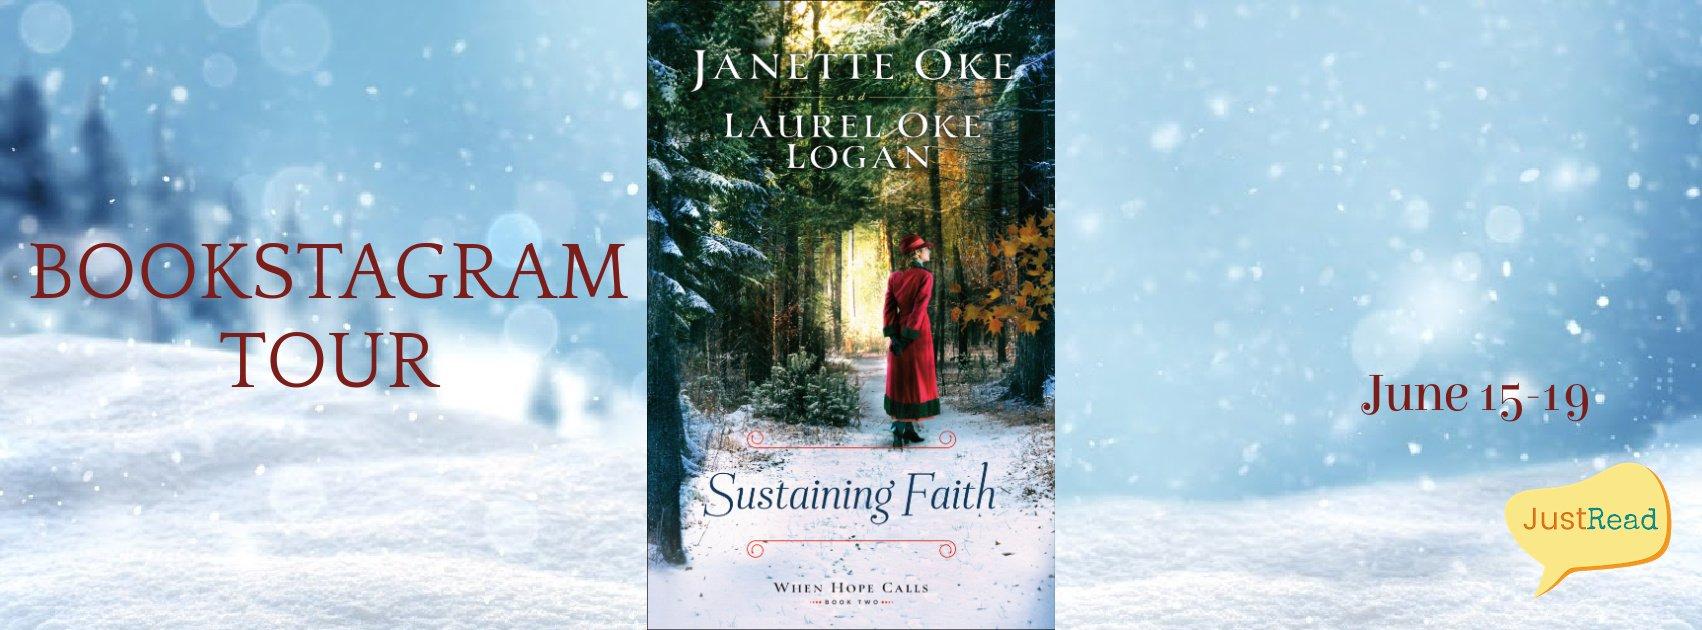 Sustaining Faith JustRead Bookstagram Tour